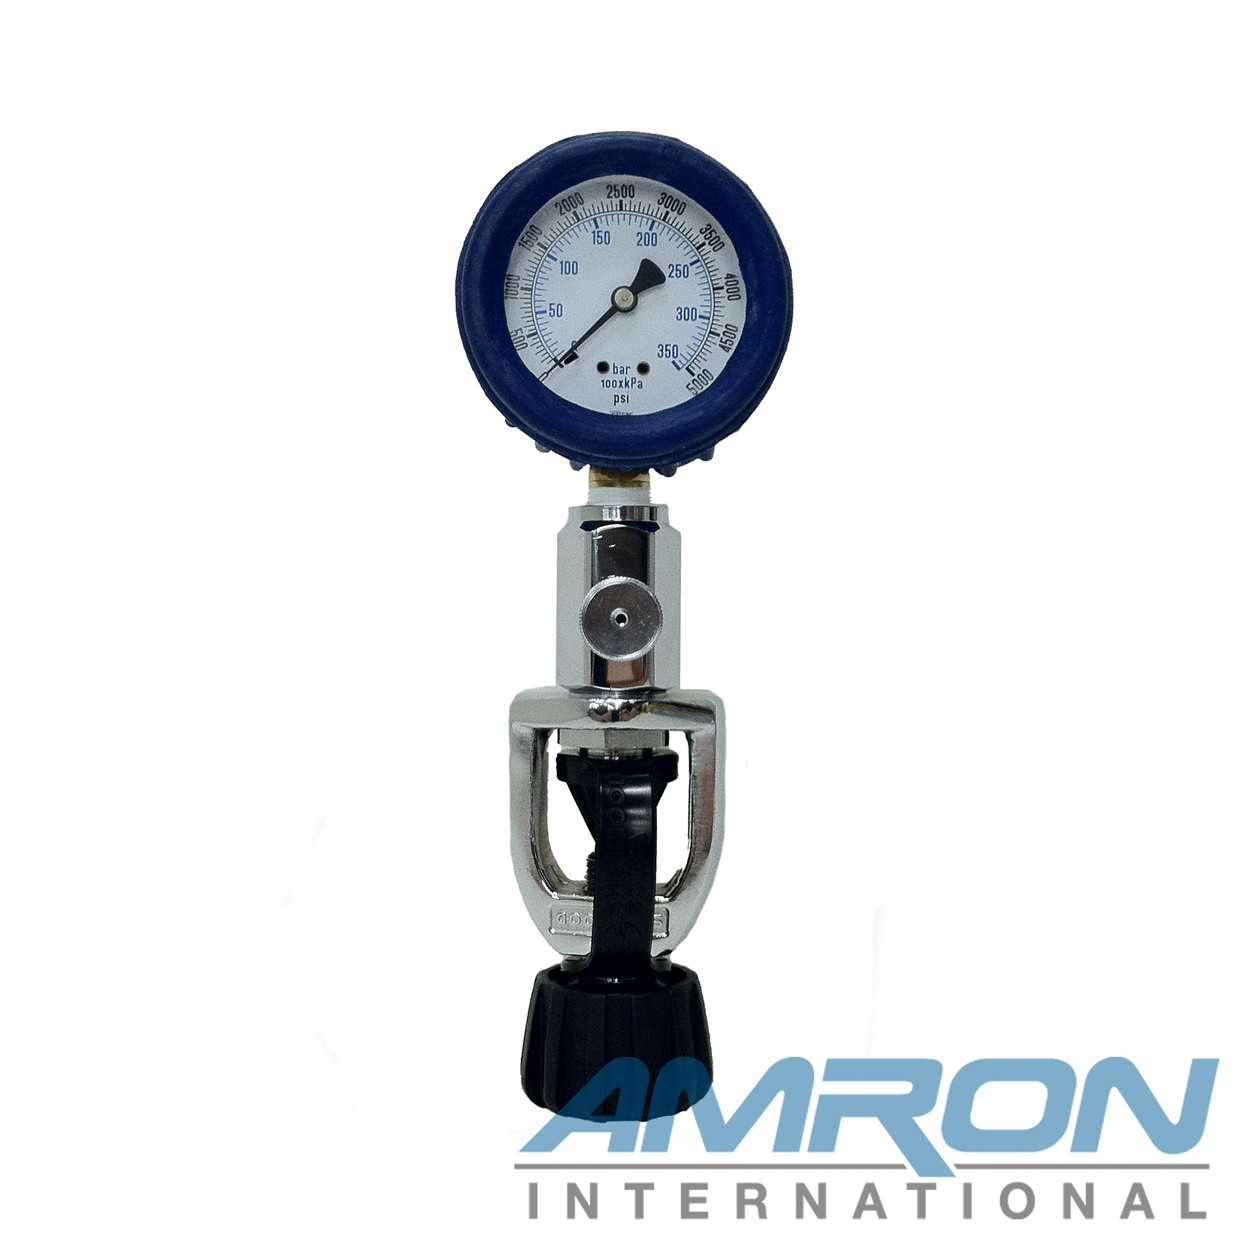 Amron International 9913-01 Tank Pressure Gauge